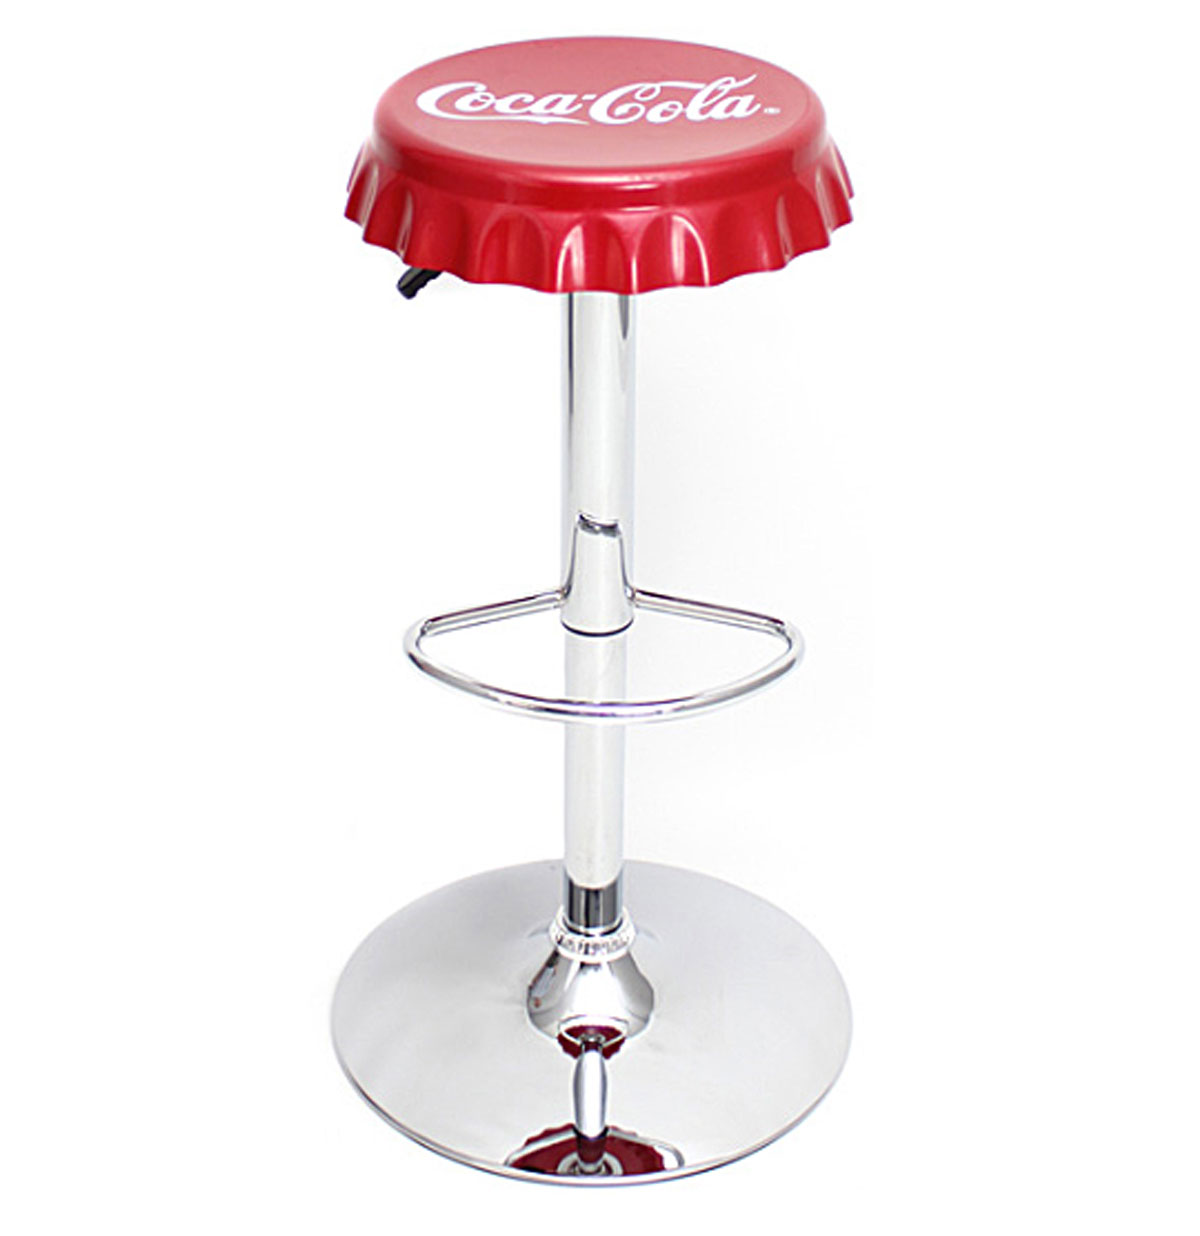 Coca-Cola Cap Barkruk